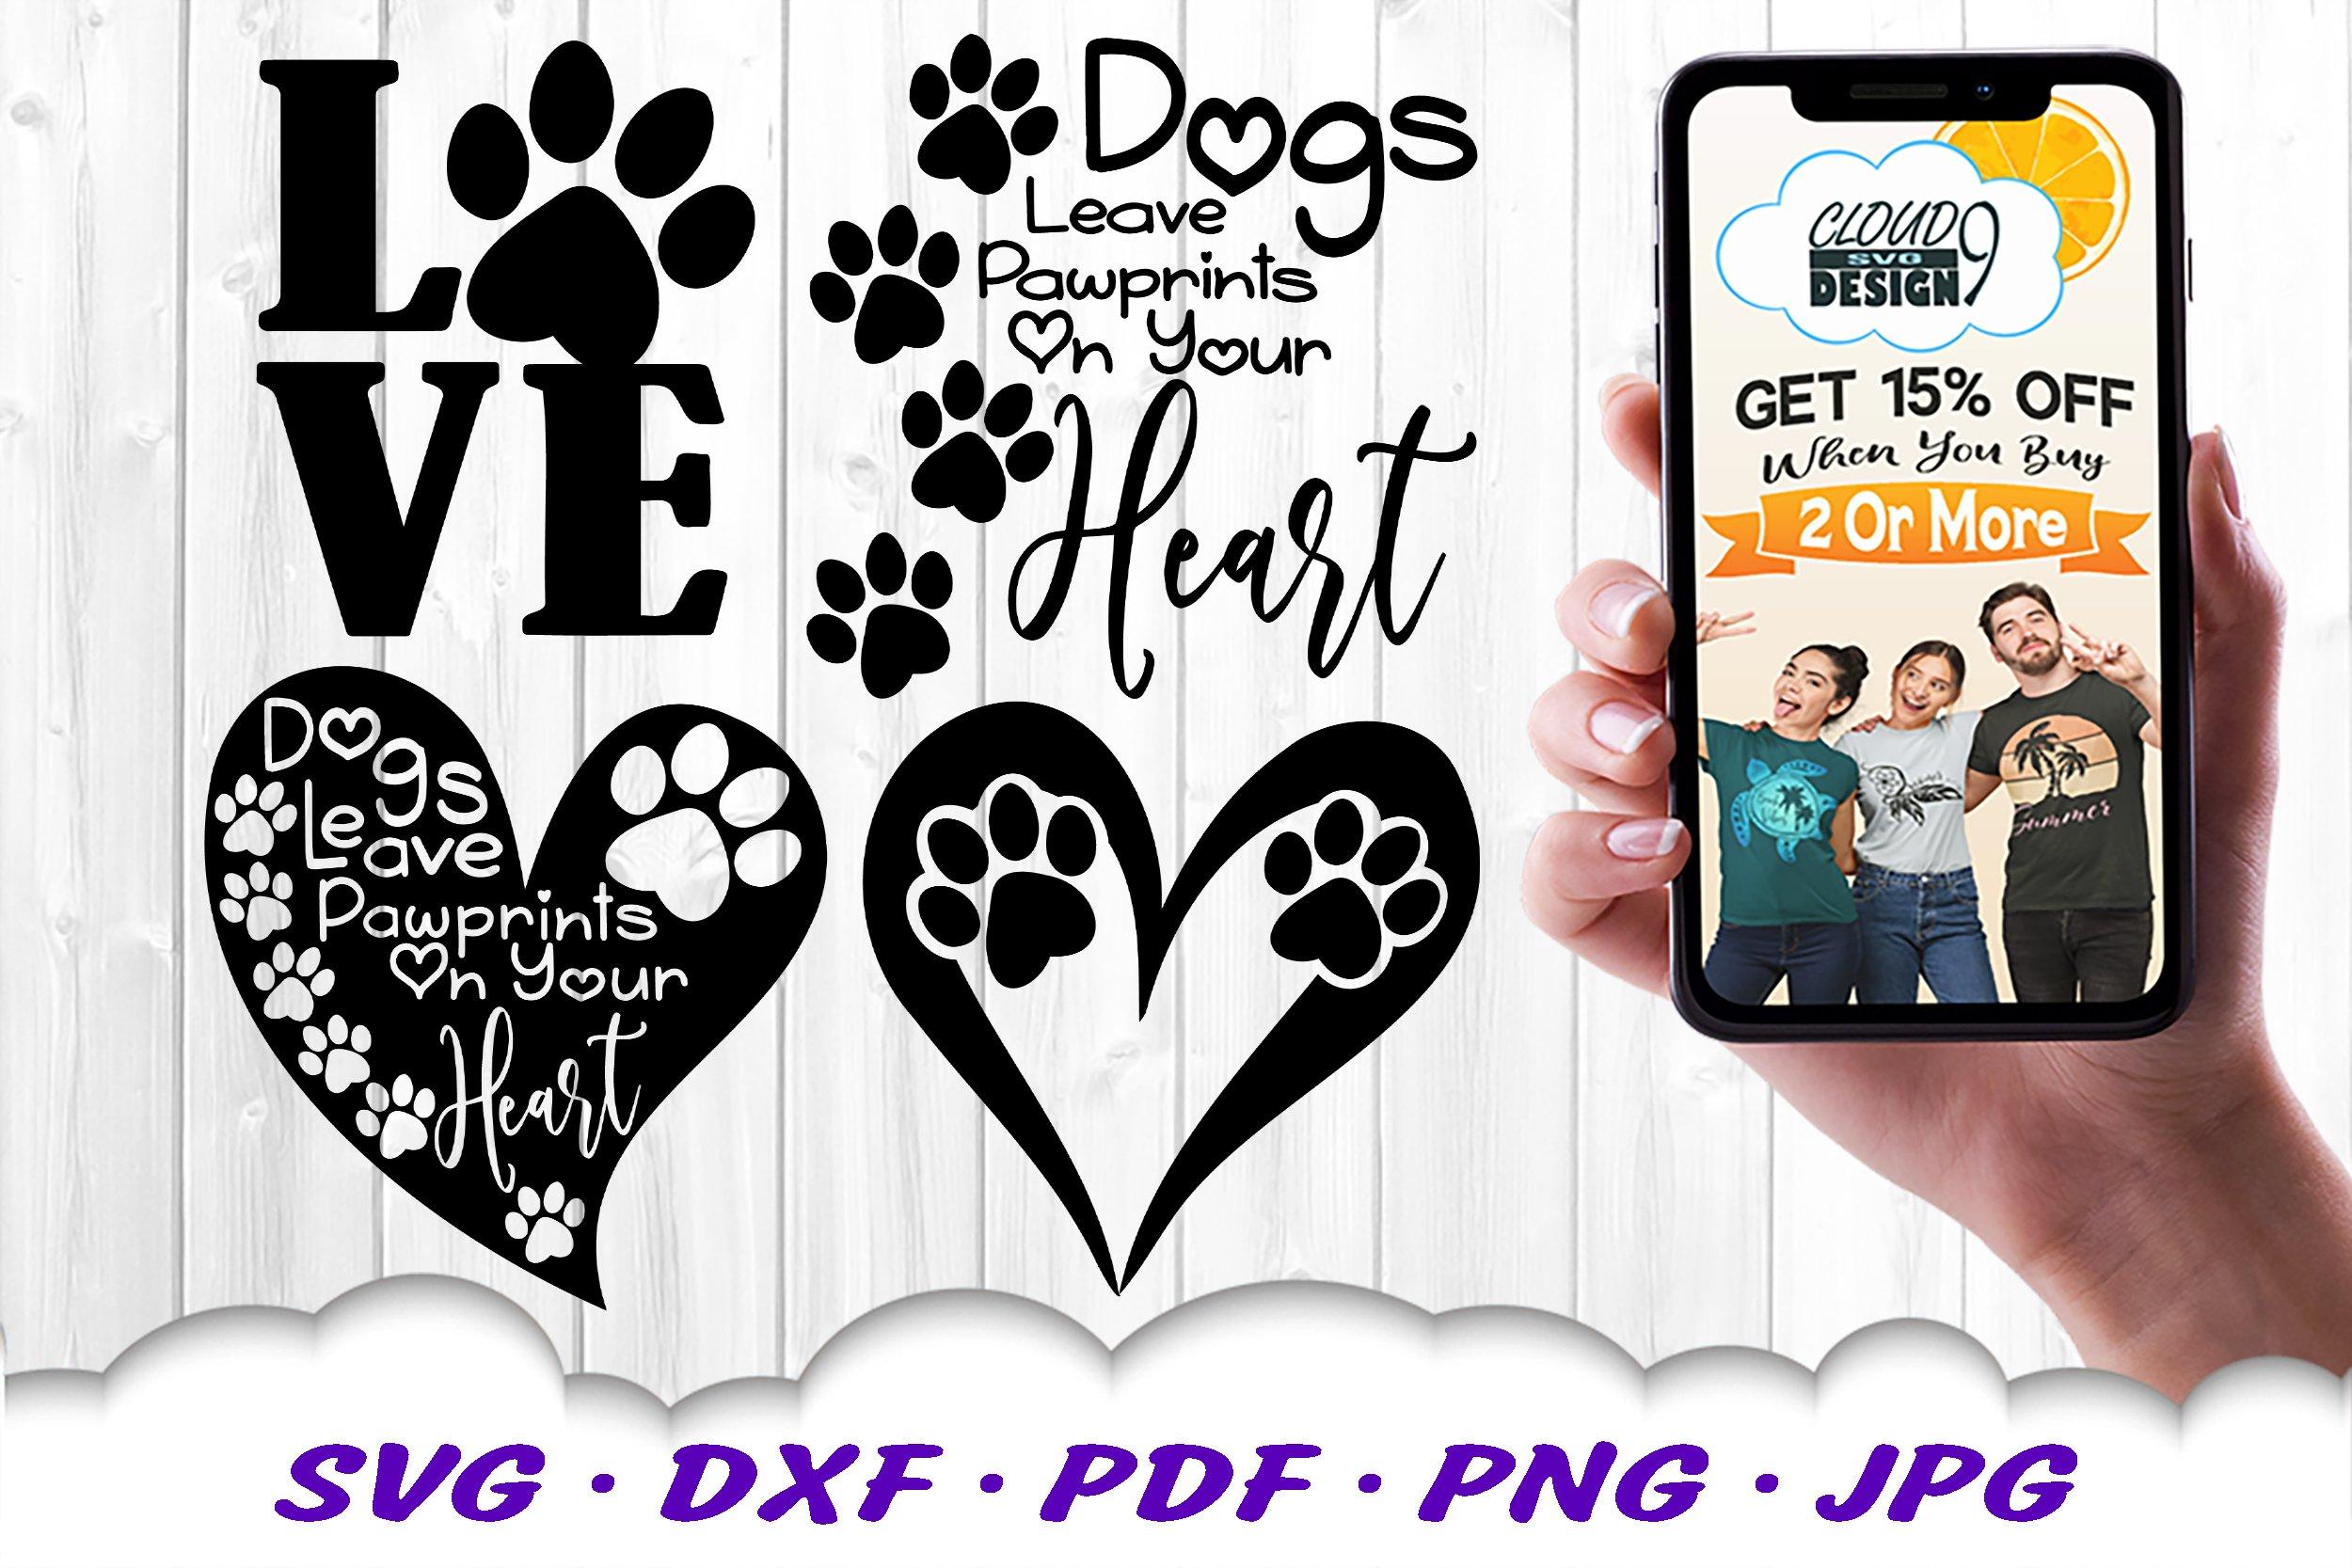 Dog Mom Paw Print Bundle SVG DXF Cut Files example image 3